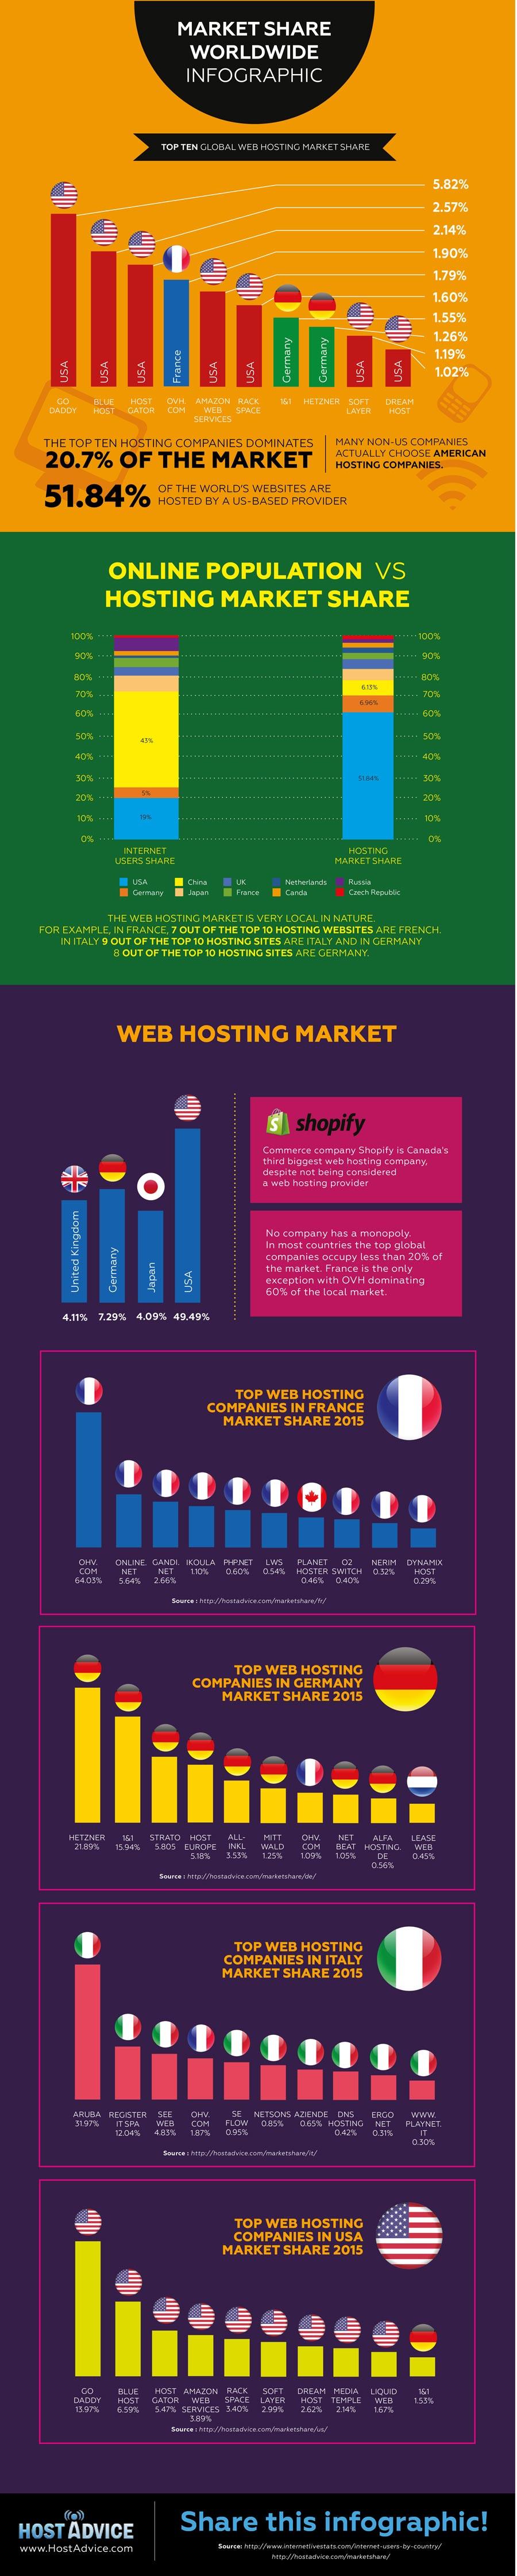 Web Hosting Pazar Payları 2015 (Küresel)